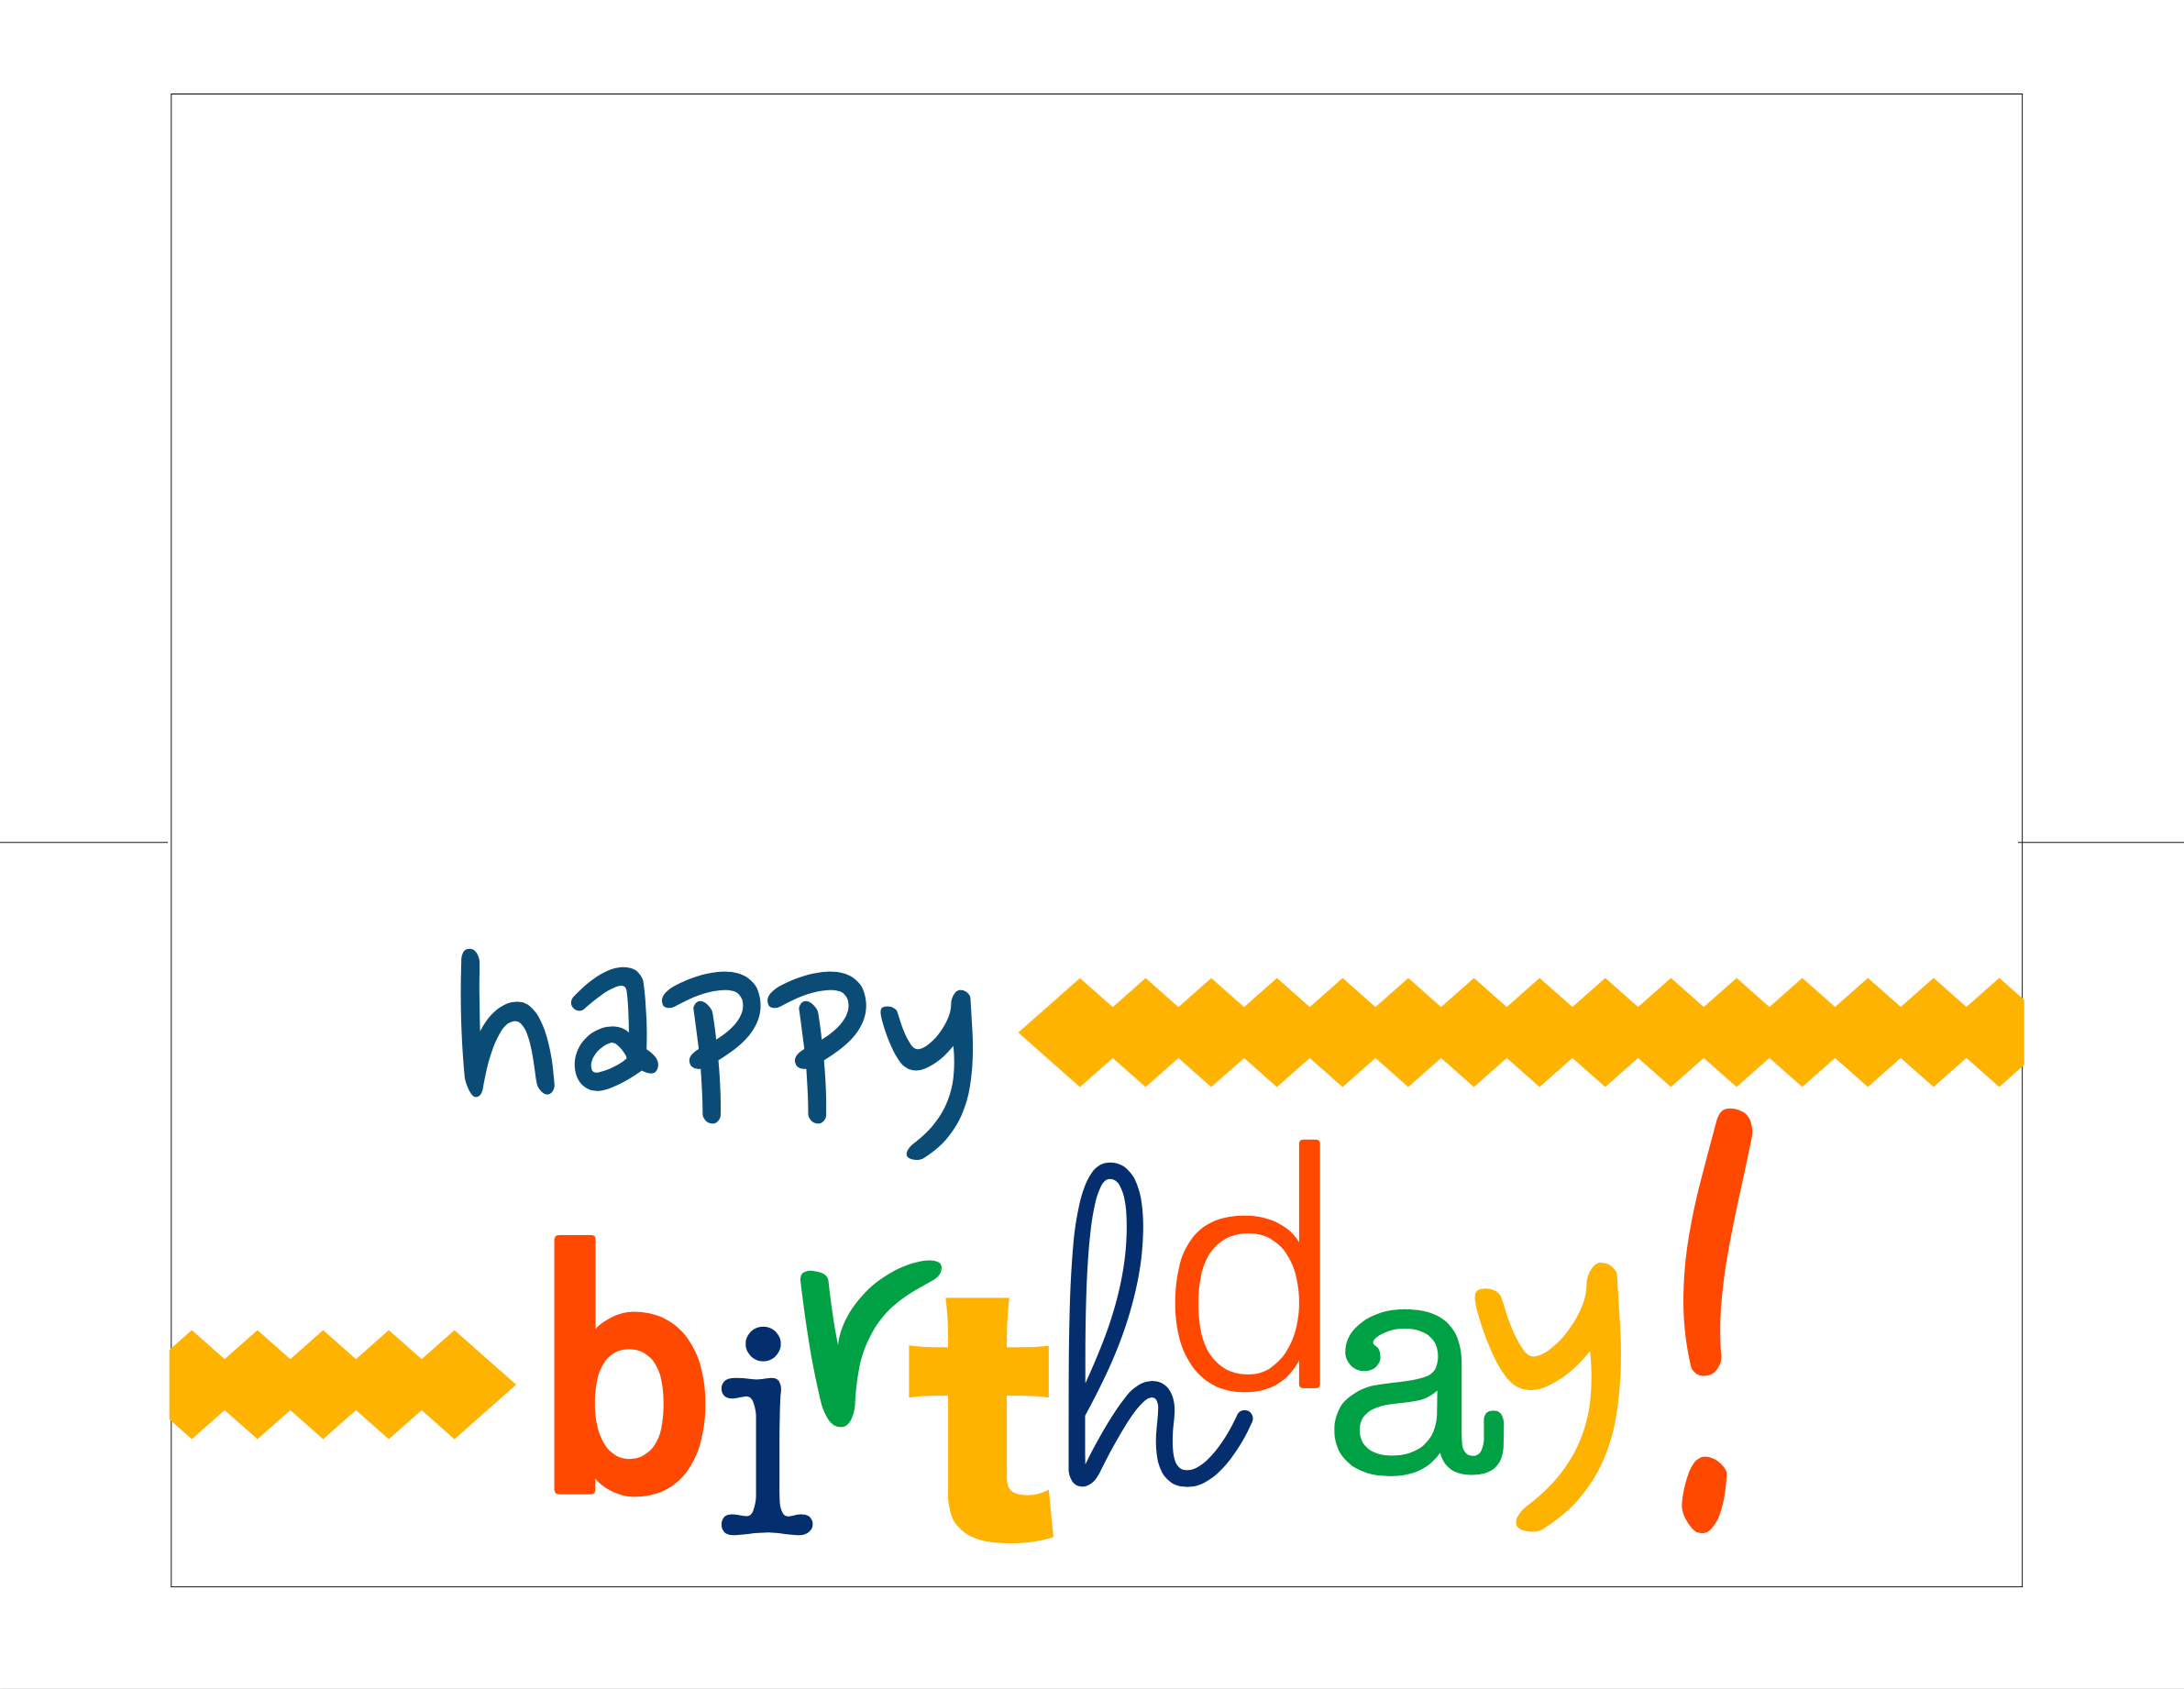 Happy Birthday Card Free Printable - How Do The Jones Do It - Free Printable Happy Birthday Cards